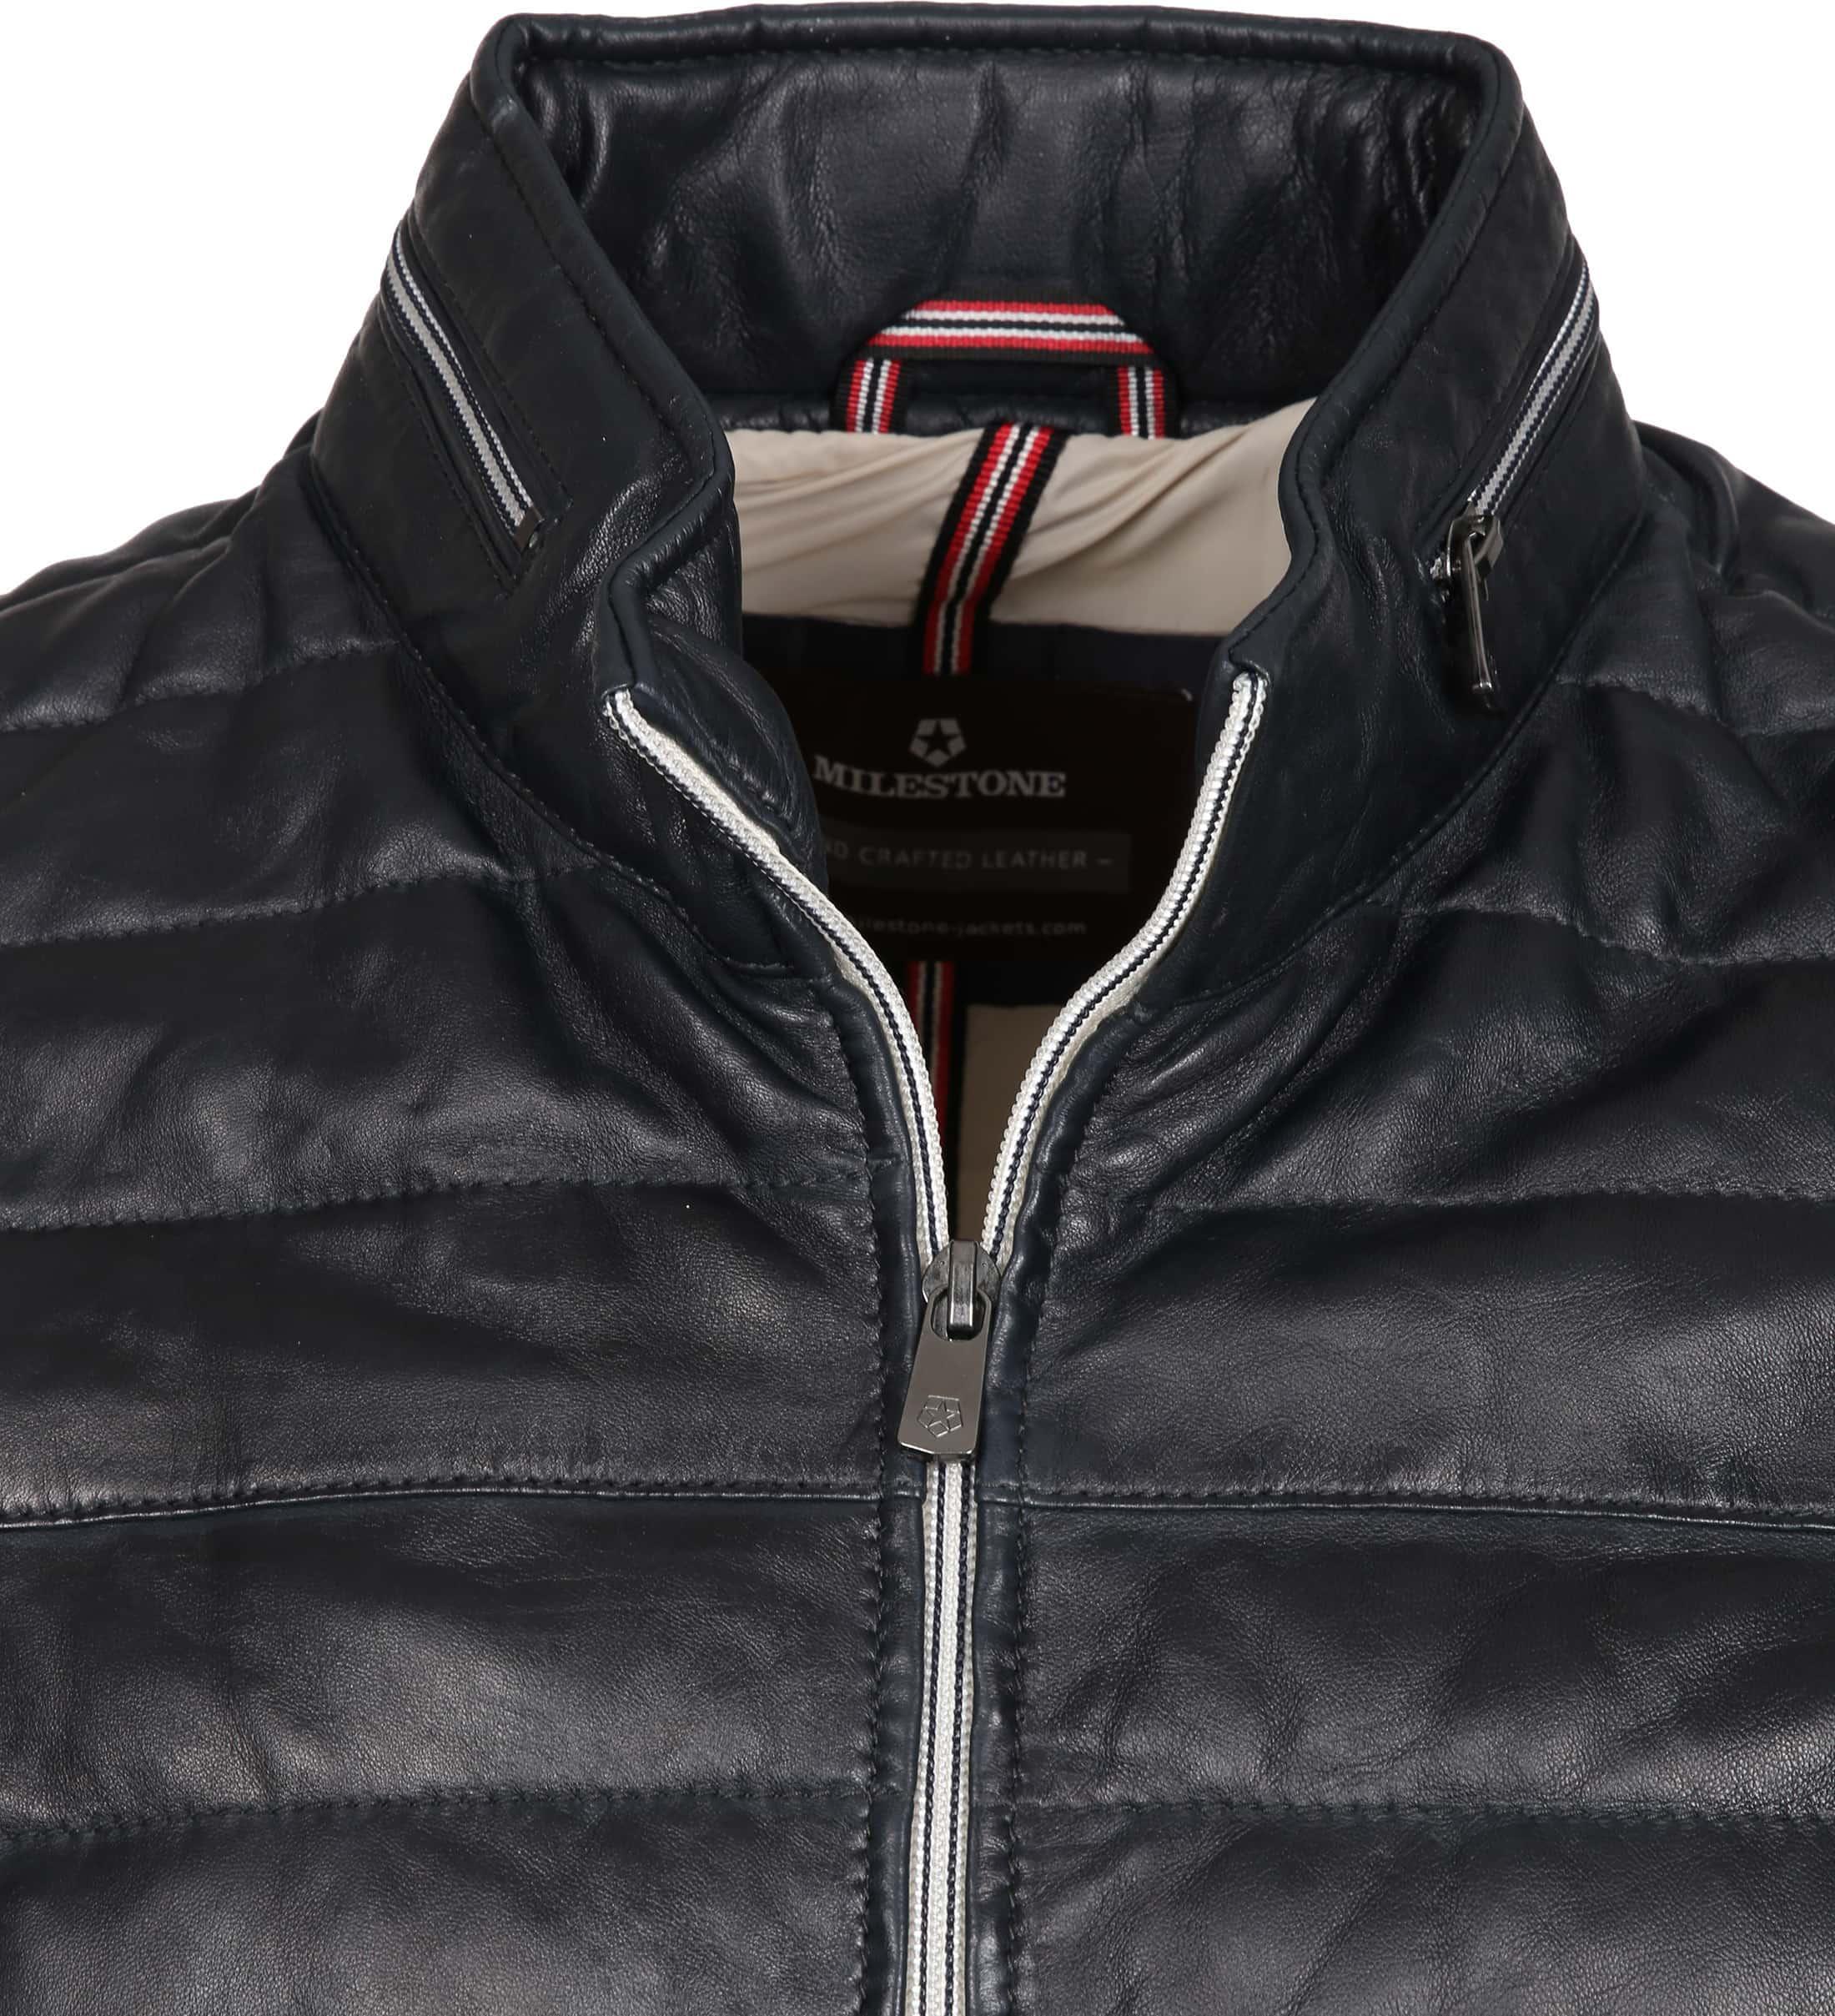 Milestone Tereno Leather Jack Navy Grey foto 1